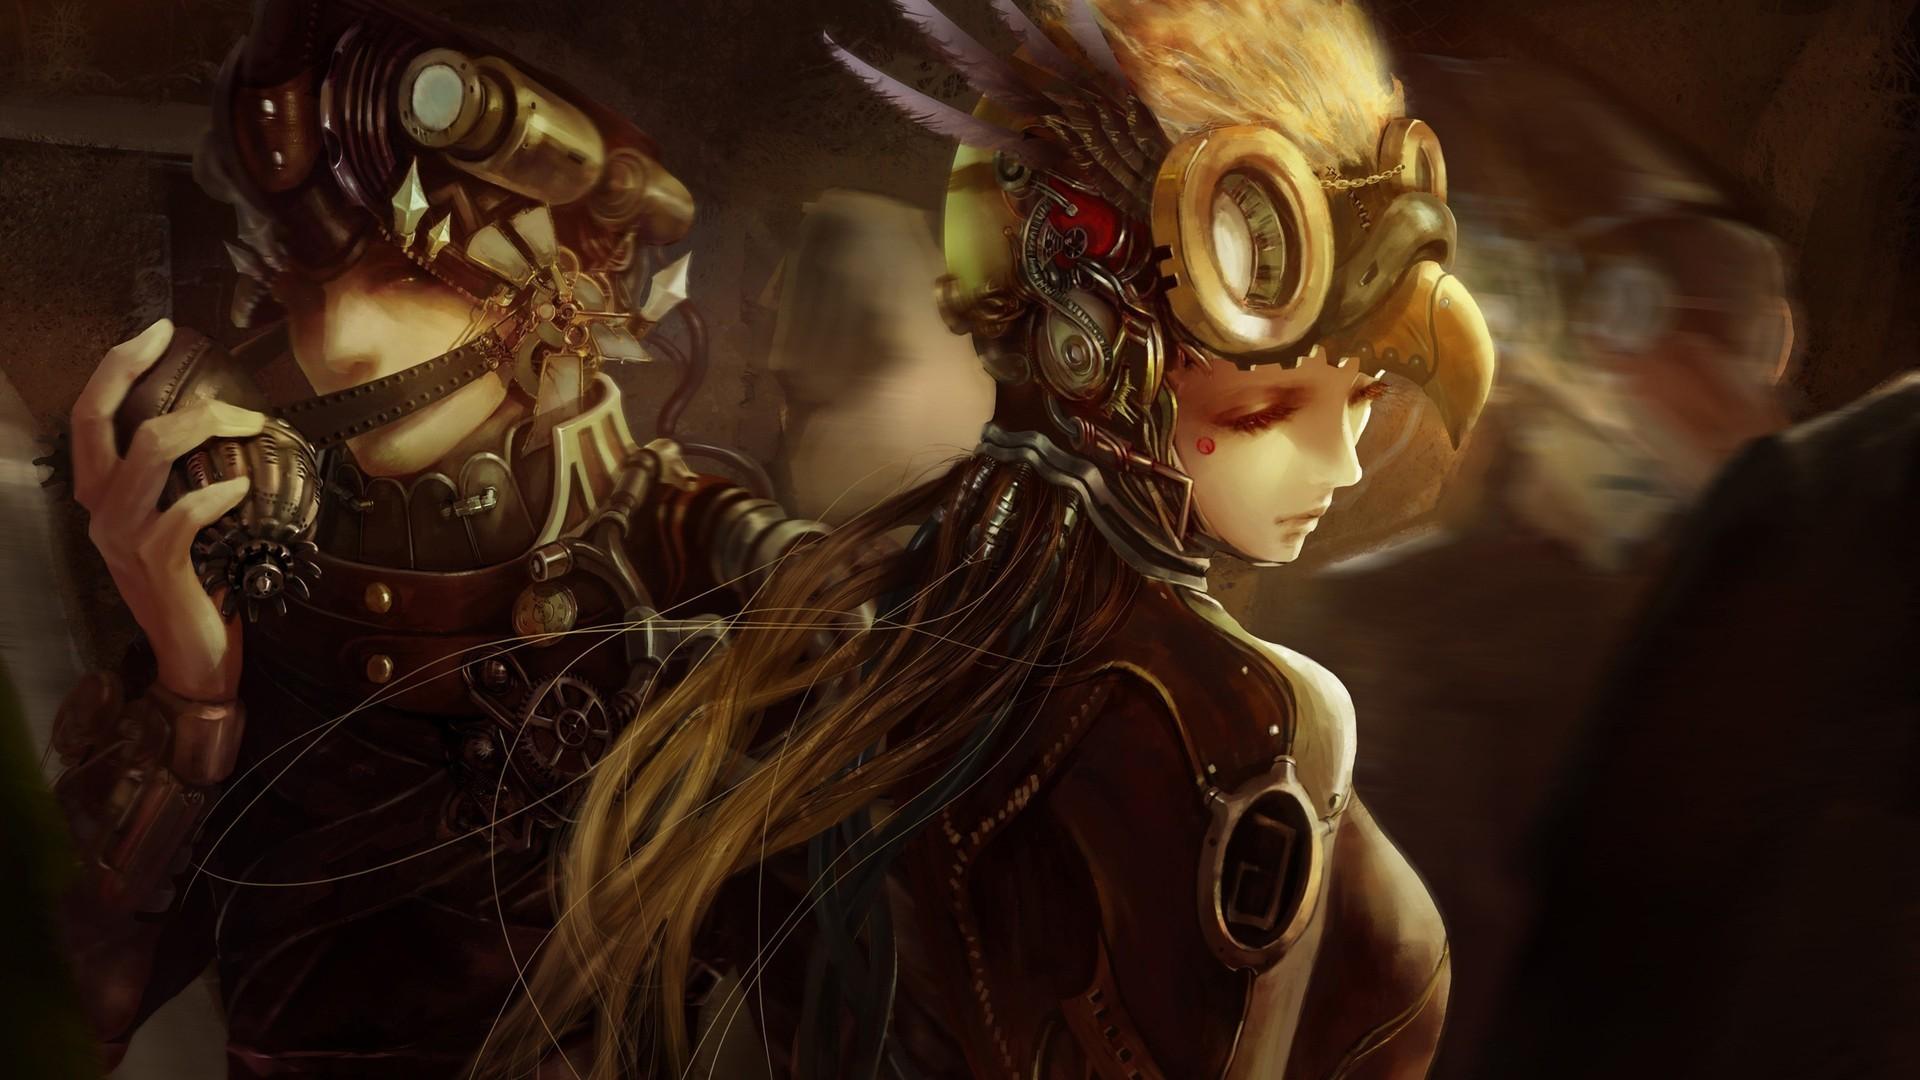 Cyberpunk Mask HD 1080 wallpaper